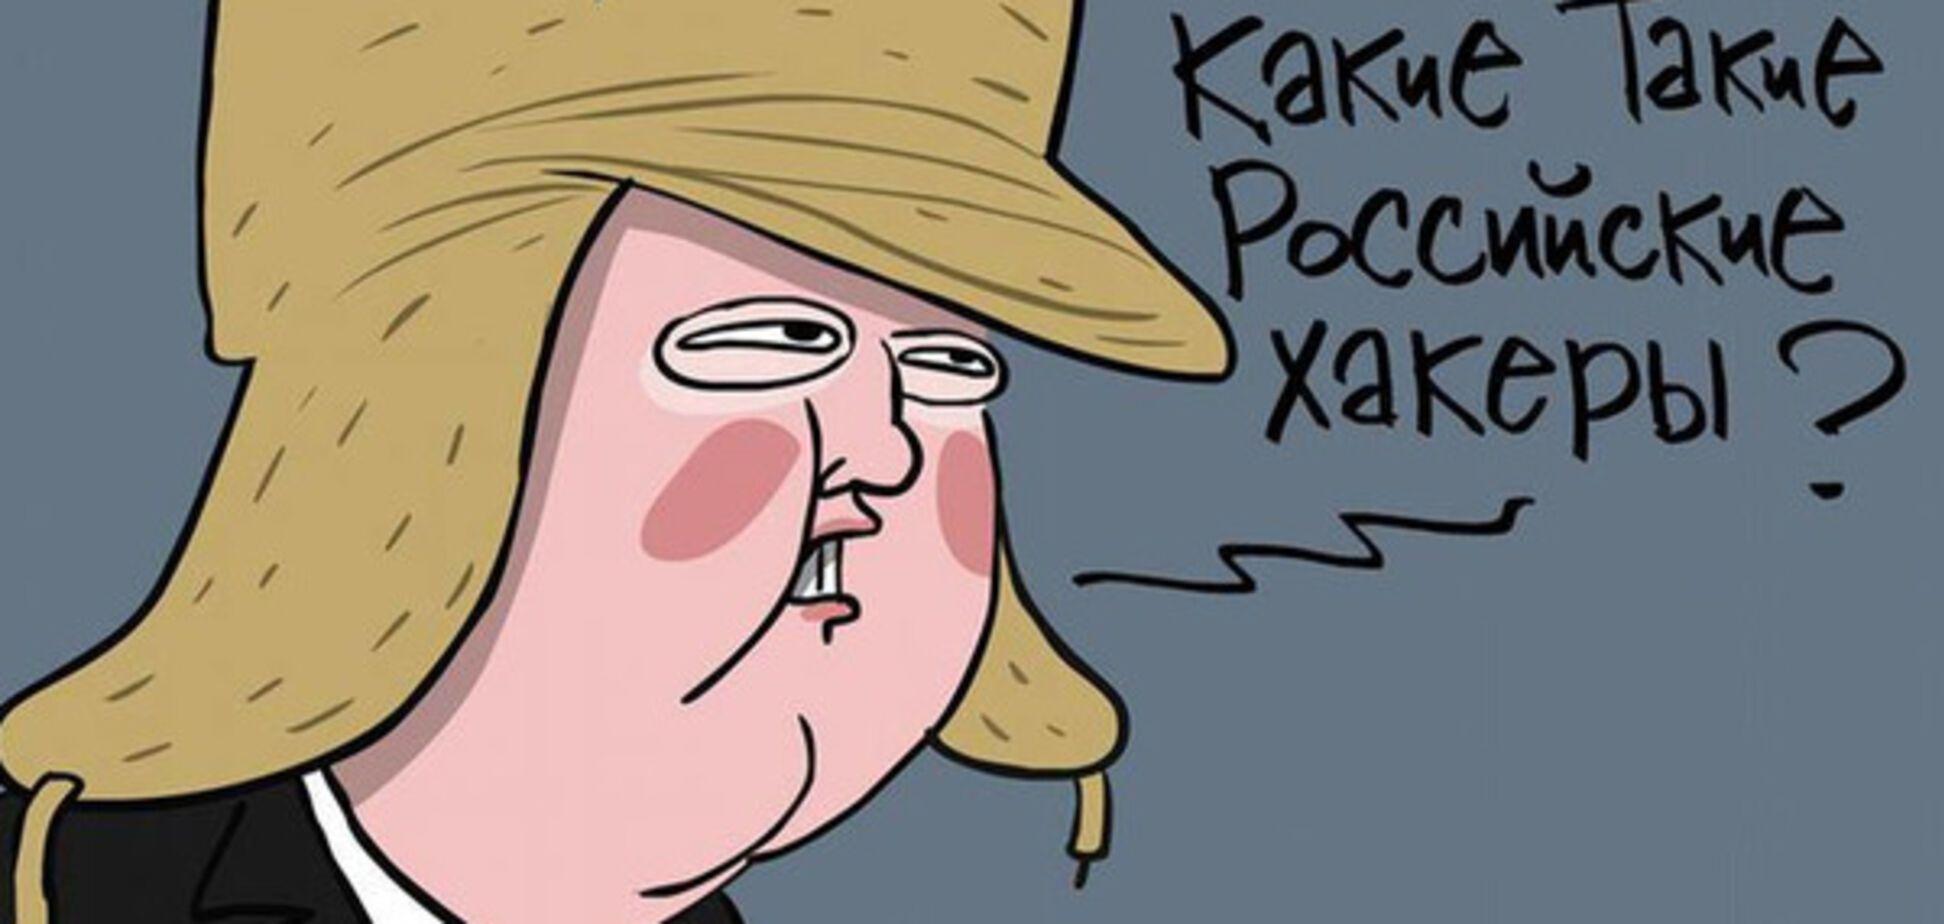 Карикатурист висміяв реакцію Трампа на скандал із хакерами Кремля